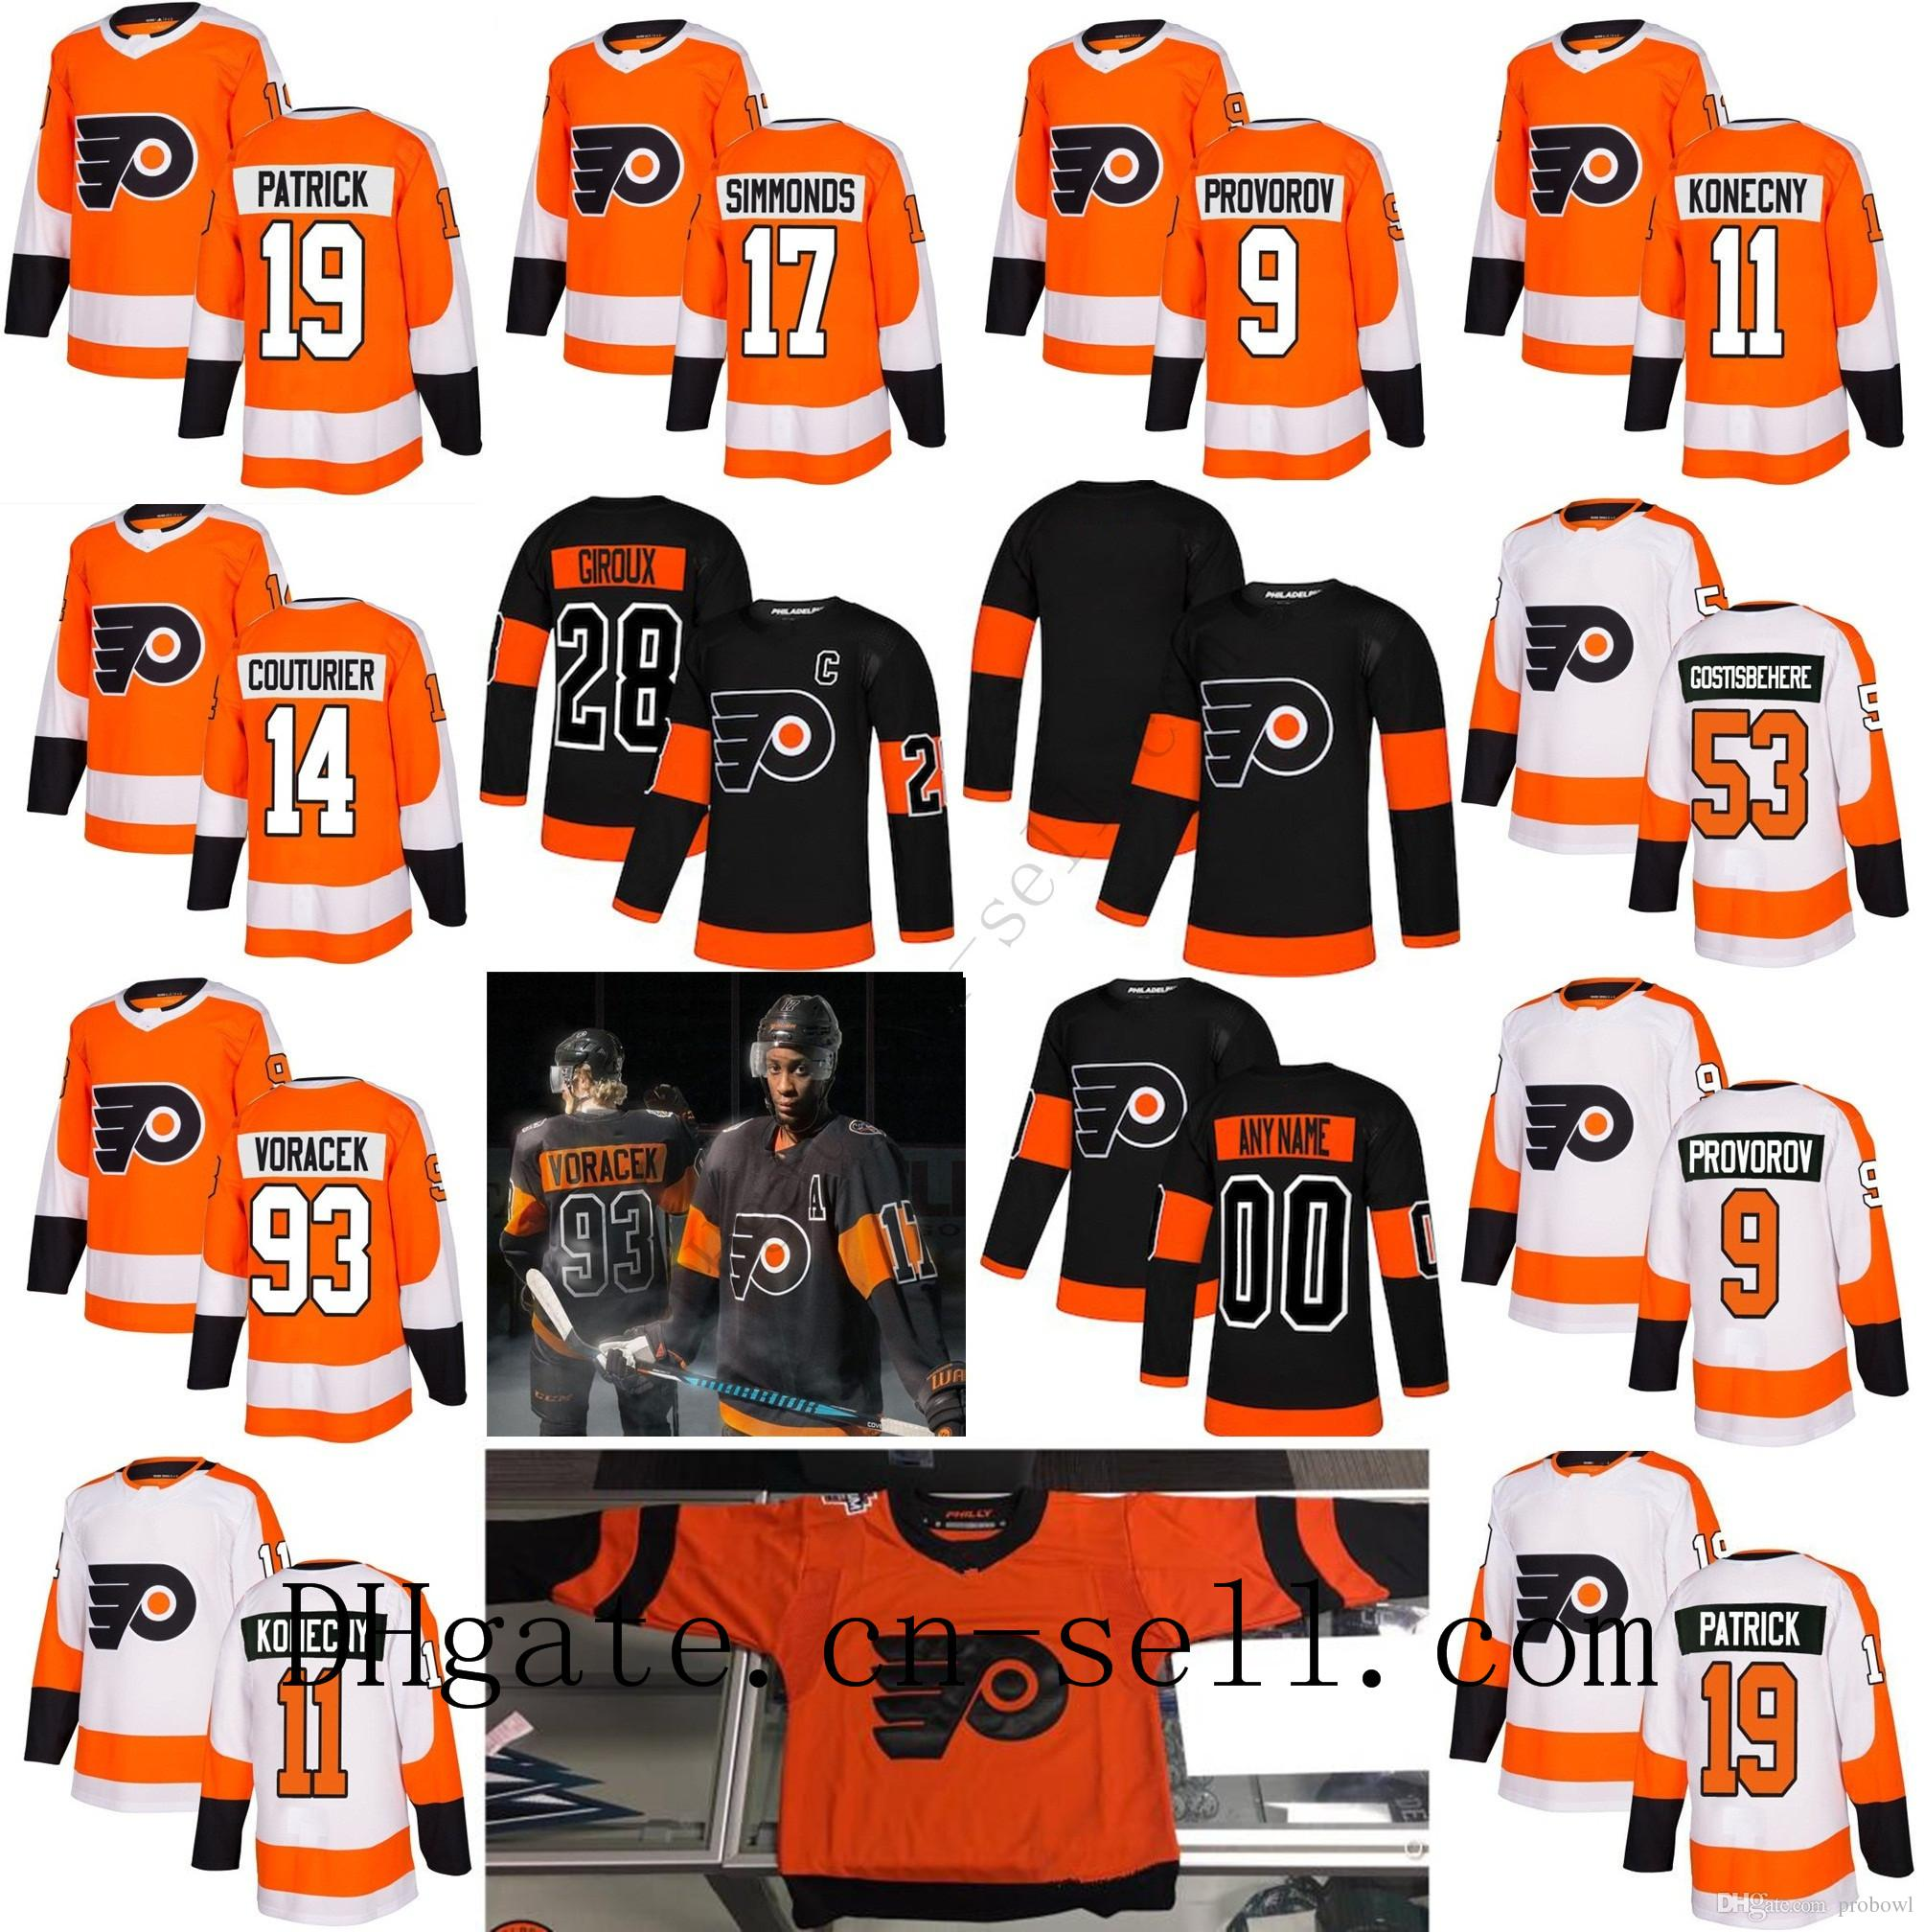 Carter Hart 2019 Stadium Series Philadelphia Flyers Mens Womens Youth 93  Voracek 53 Gostisbehere 17 Simmonds 28 Claude Giroux Hockey Jersey  Philadelphia ... f33572542